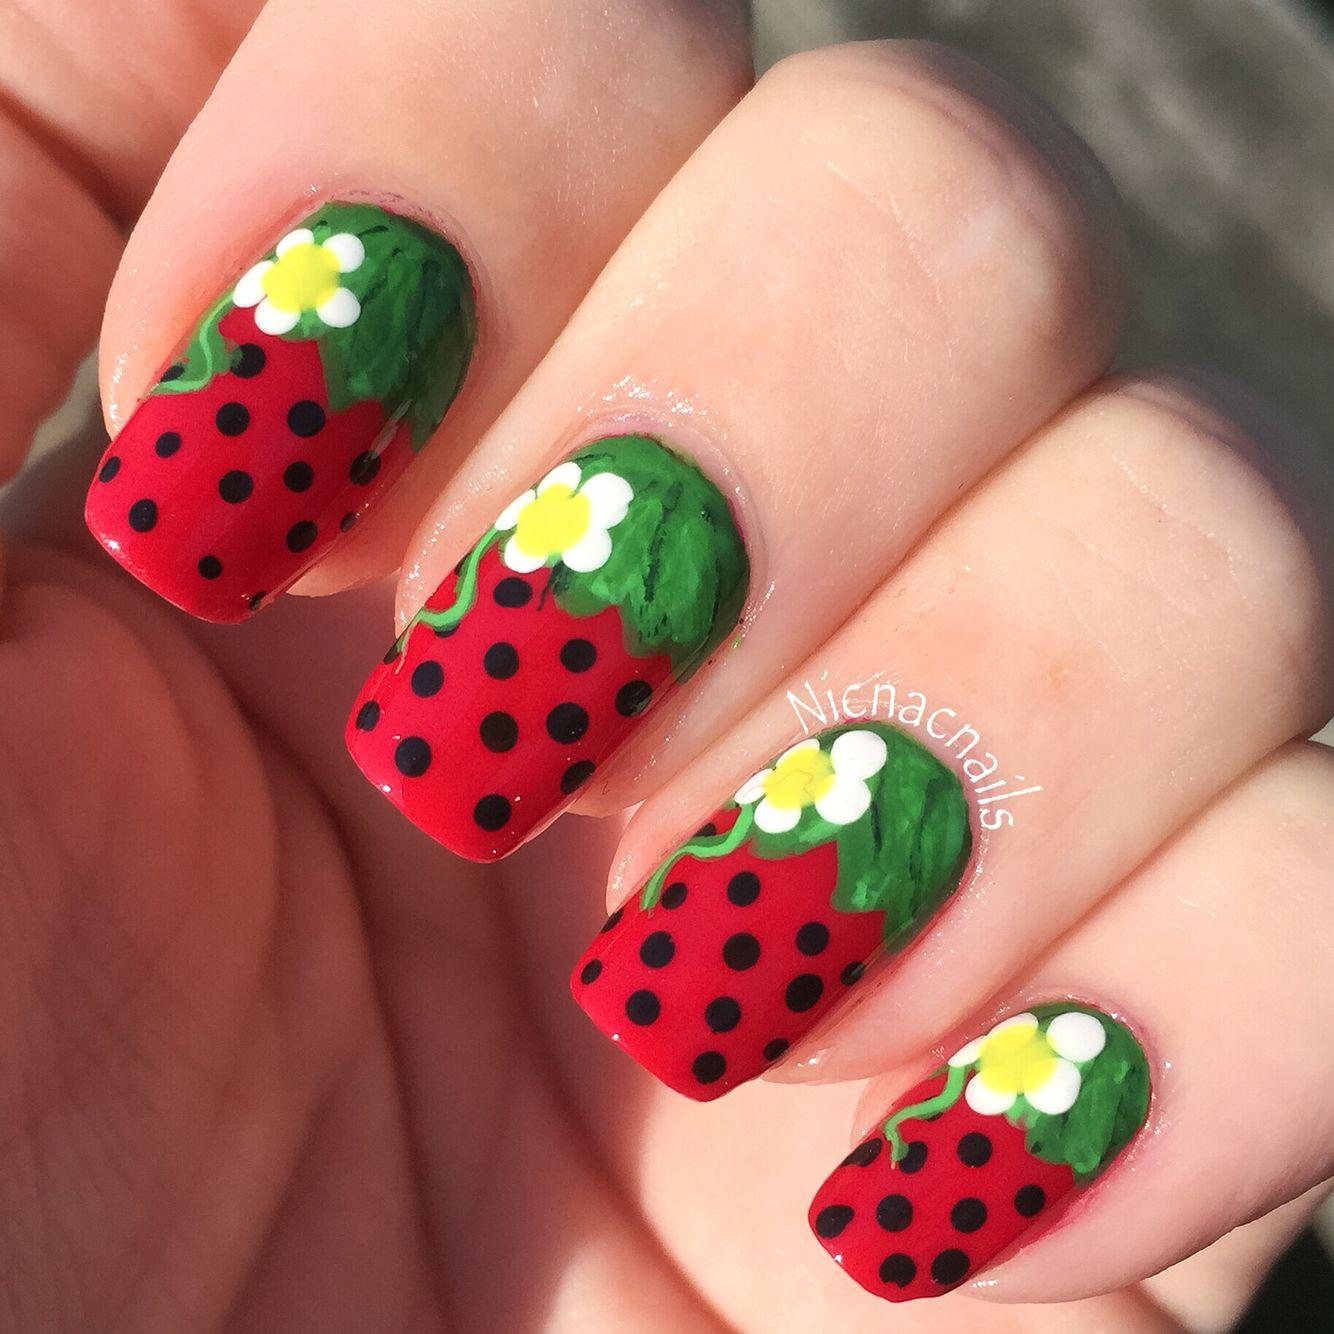 Strawberry nails! @nicnacnails - Strawberry Nails! @nicnacnails Beauty Pinterest Strawberry